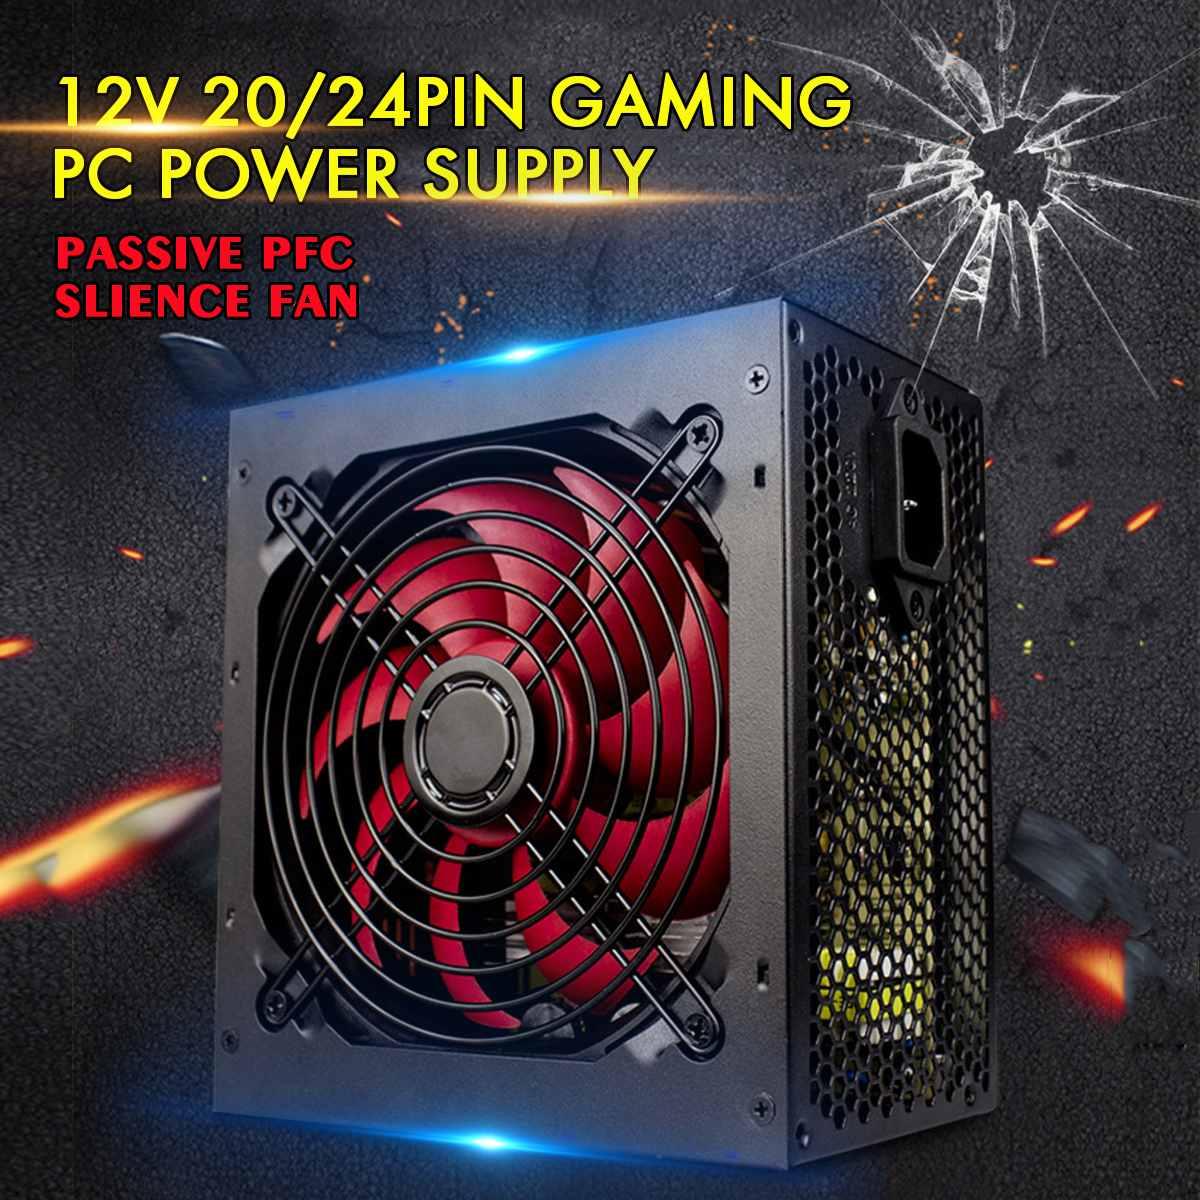 Max 650W alimentation Passive PFC ventilateur silencieux ATX 20/24pin 12V PC ordinateur SATA Gaming PC alimentation